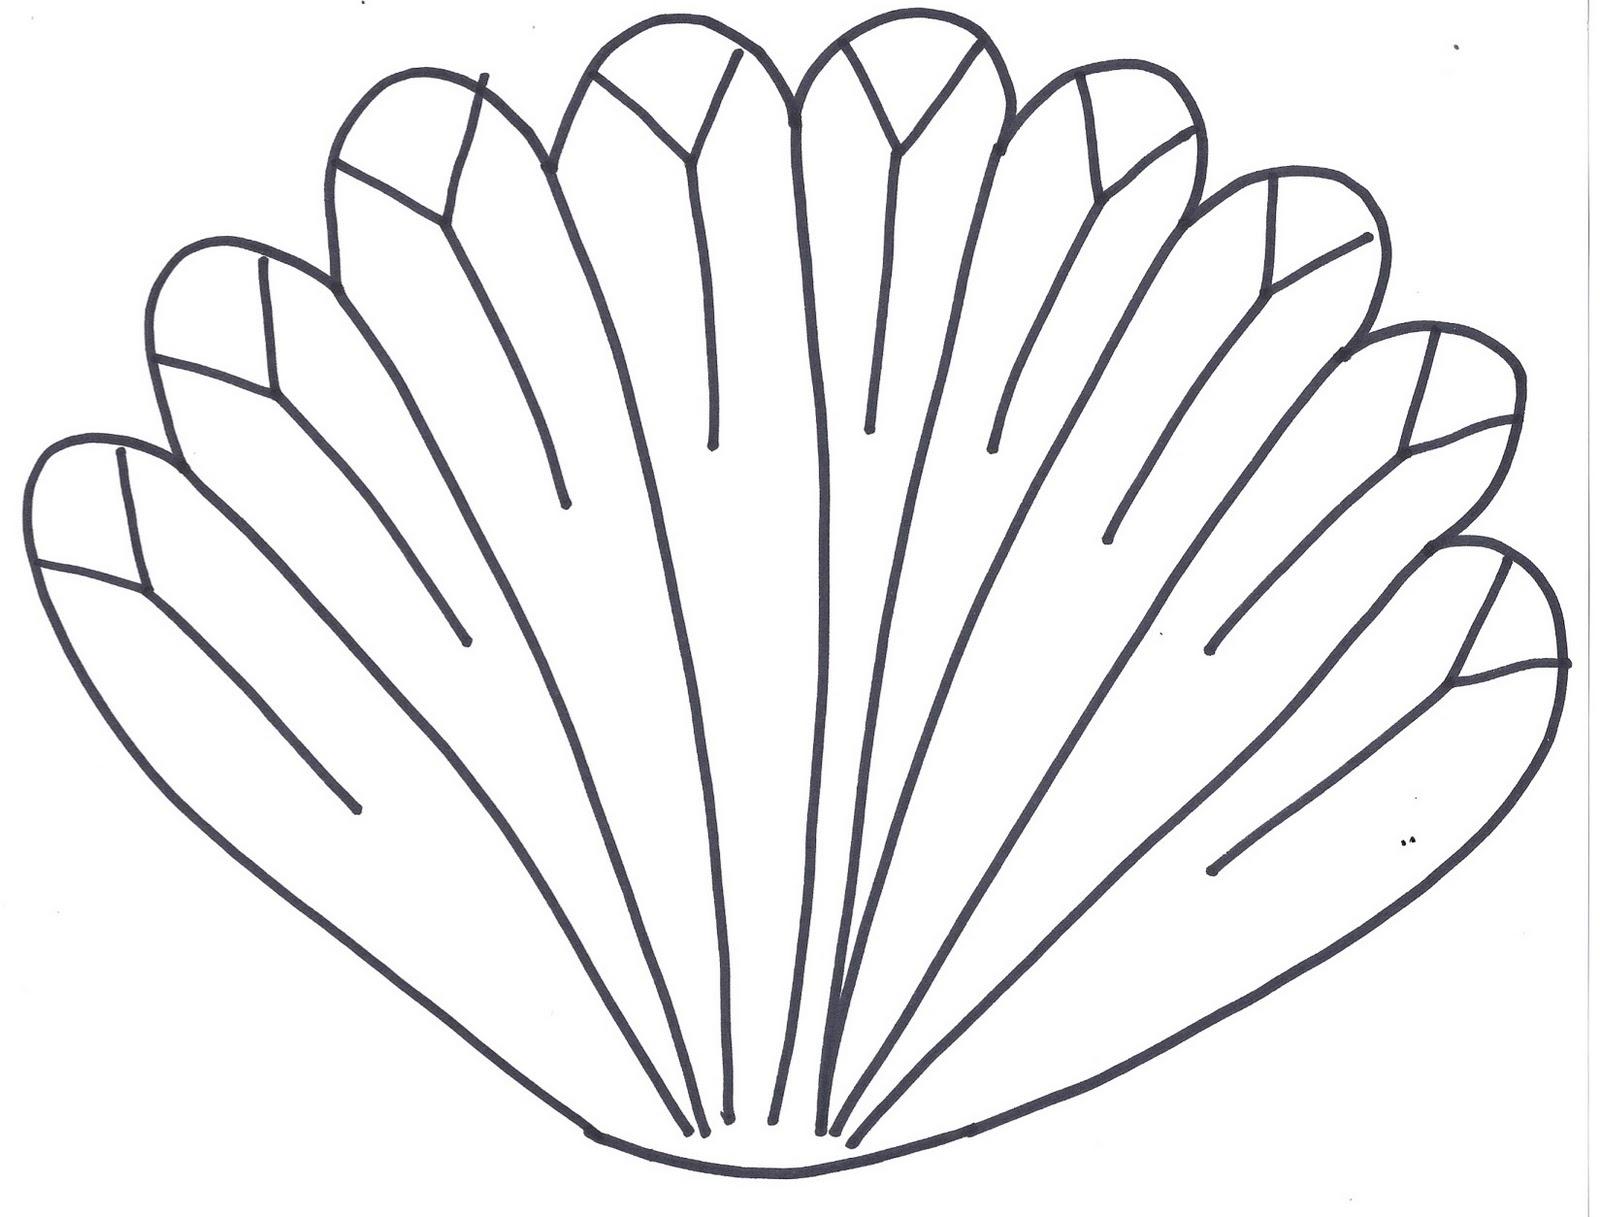 Free Cartoon Turkey Feathers, Download Free Clip Art, Free.